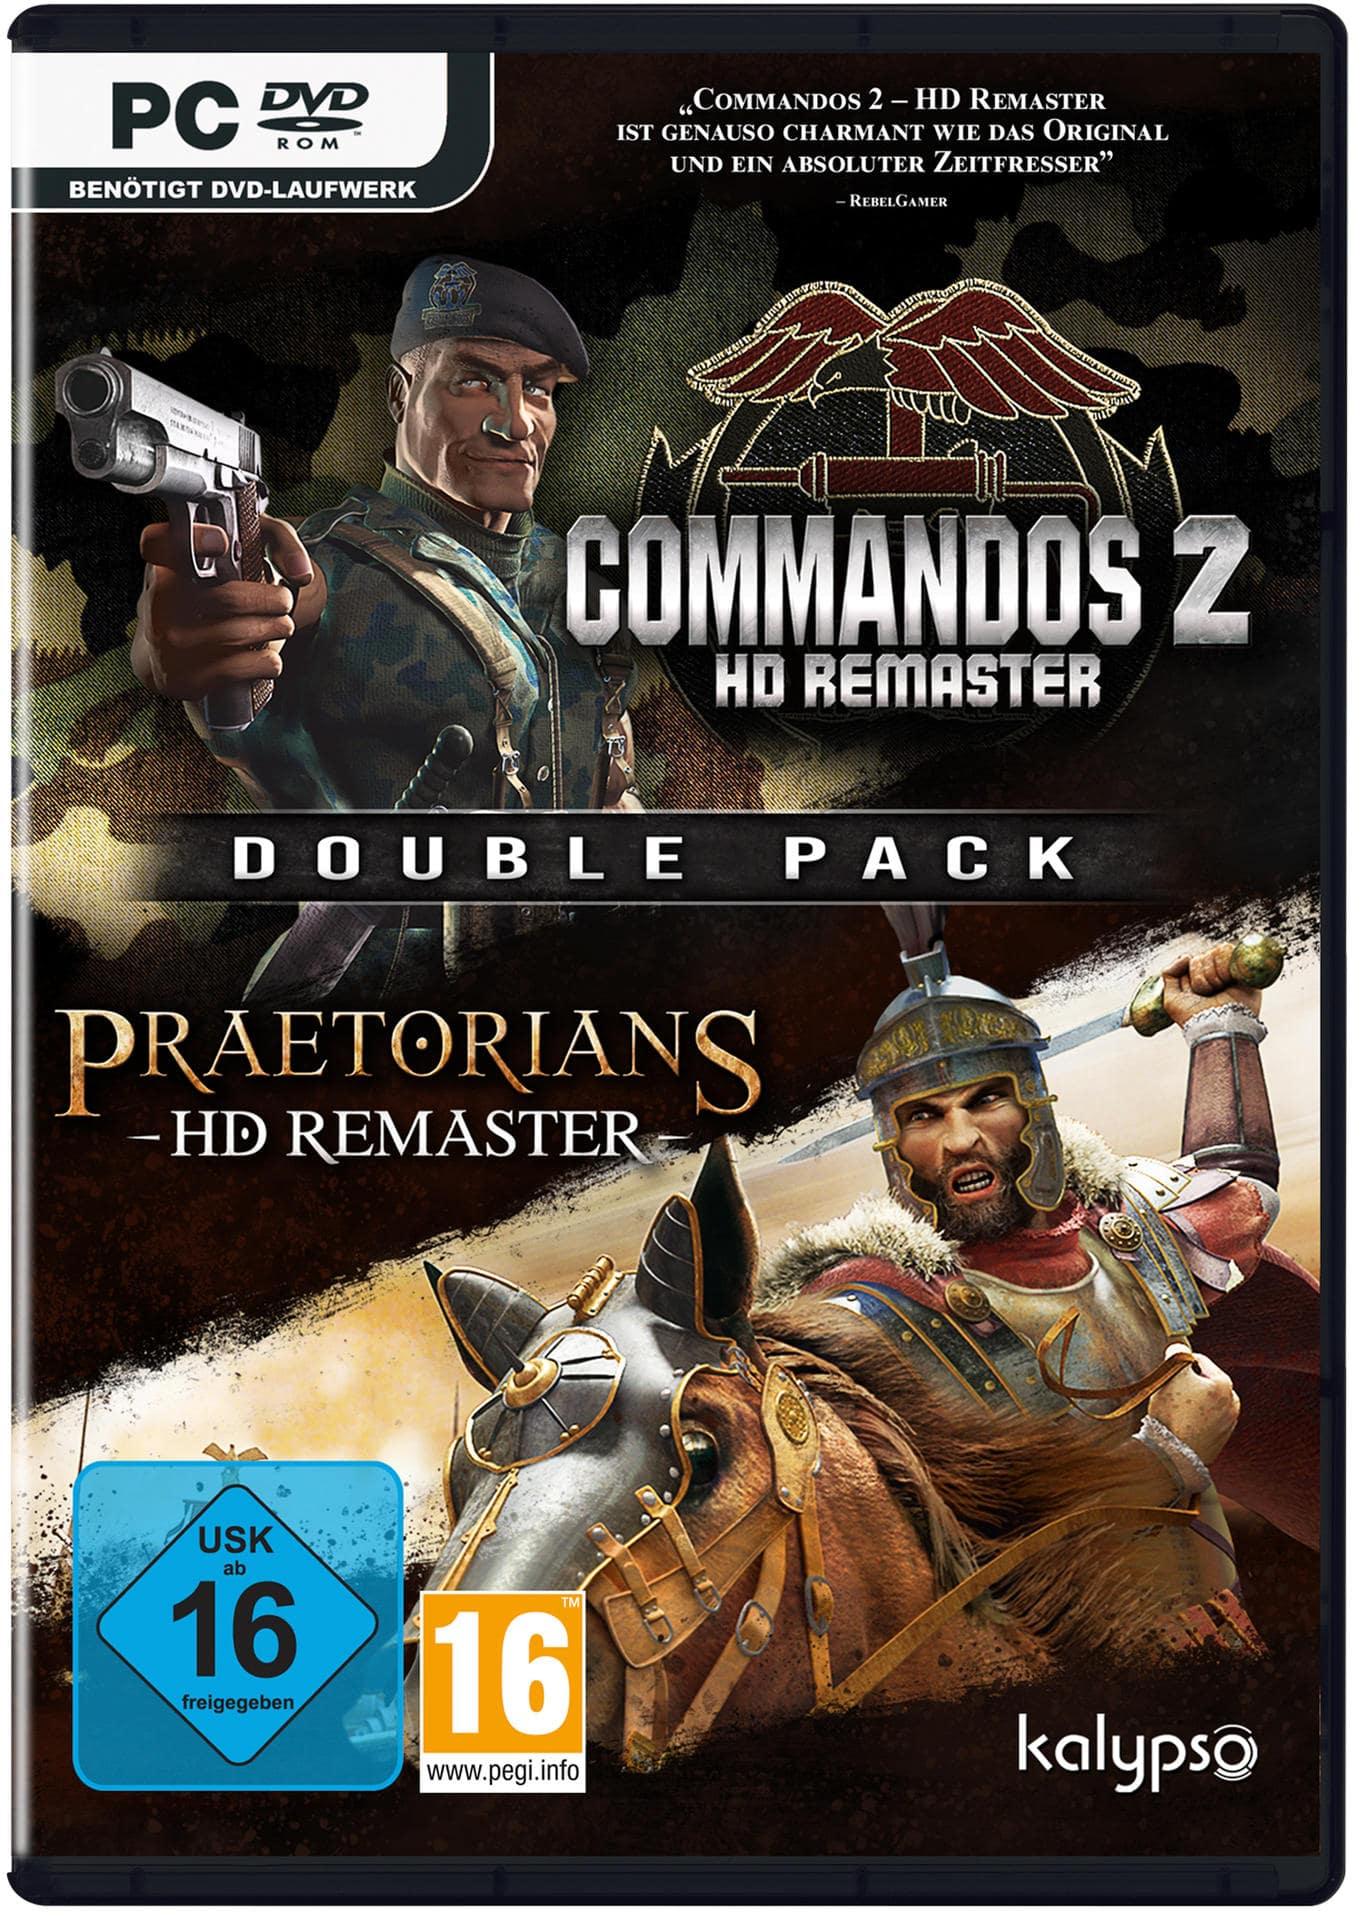 Commandos 2 & Praetorians: HD Remaster Double Pack (PC) für 39,99 Euro